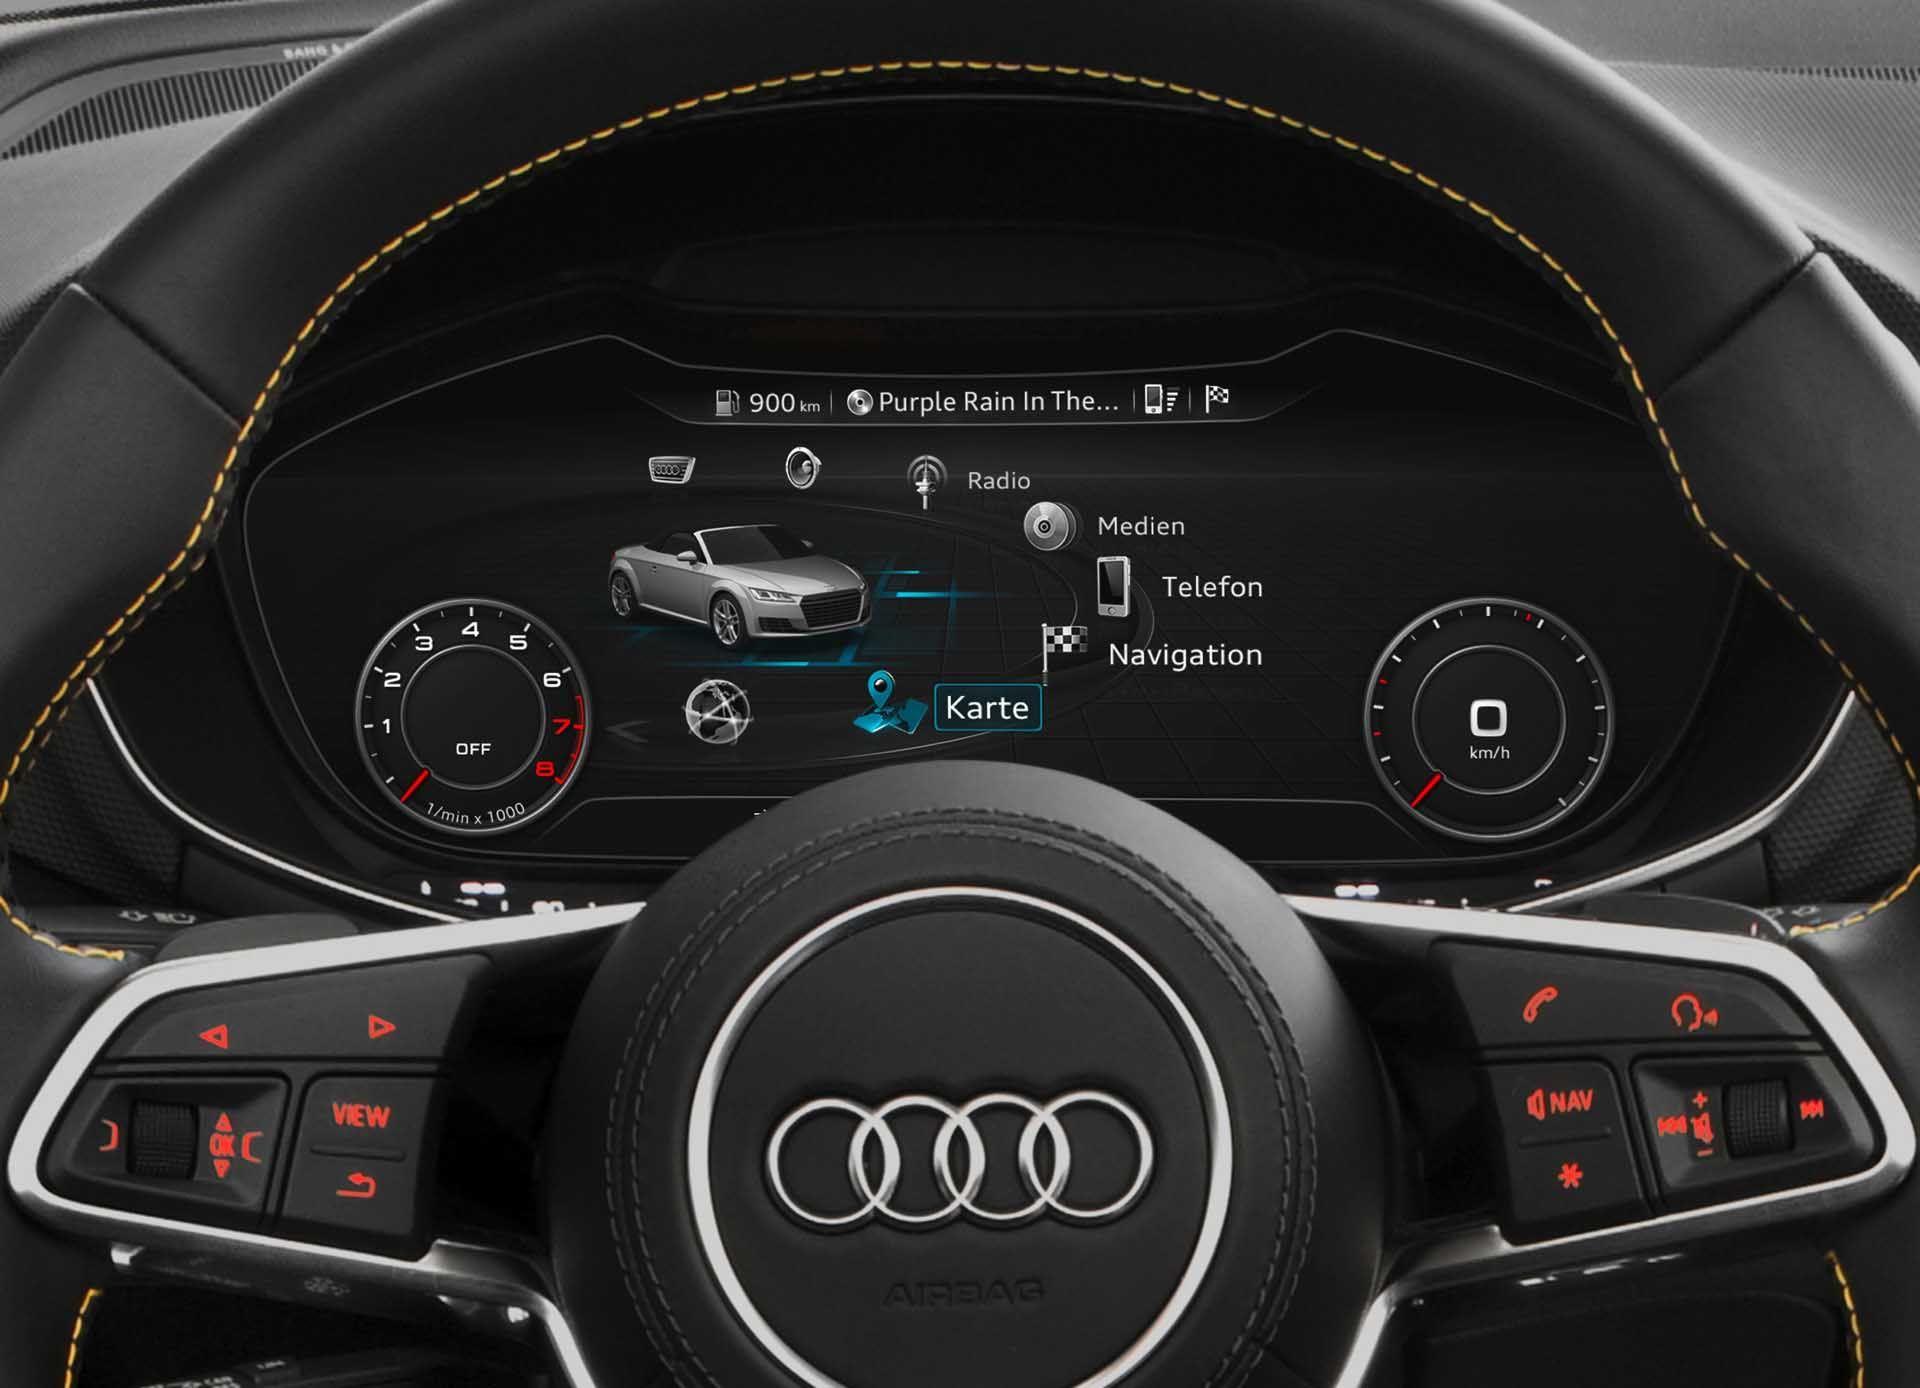 Download Impressive 2015 Audi Tts Roadster Steering Wheel 1 Mobile Wallpaper Full Size 1264